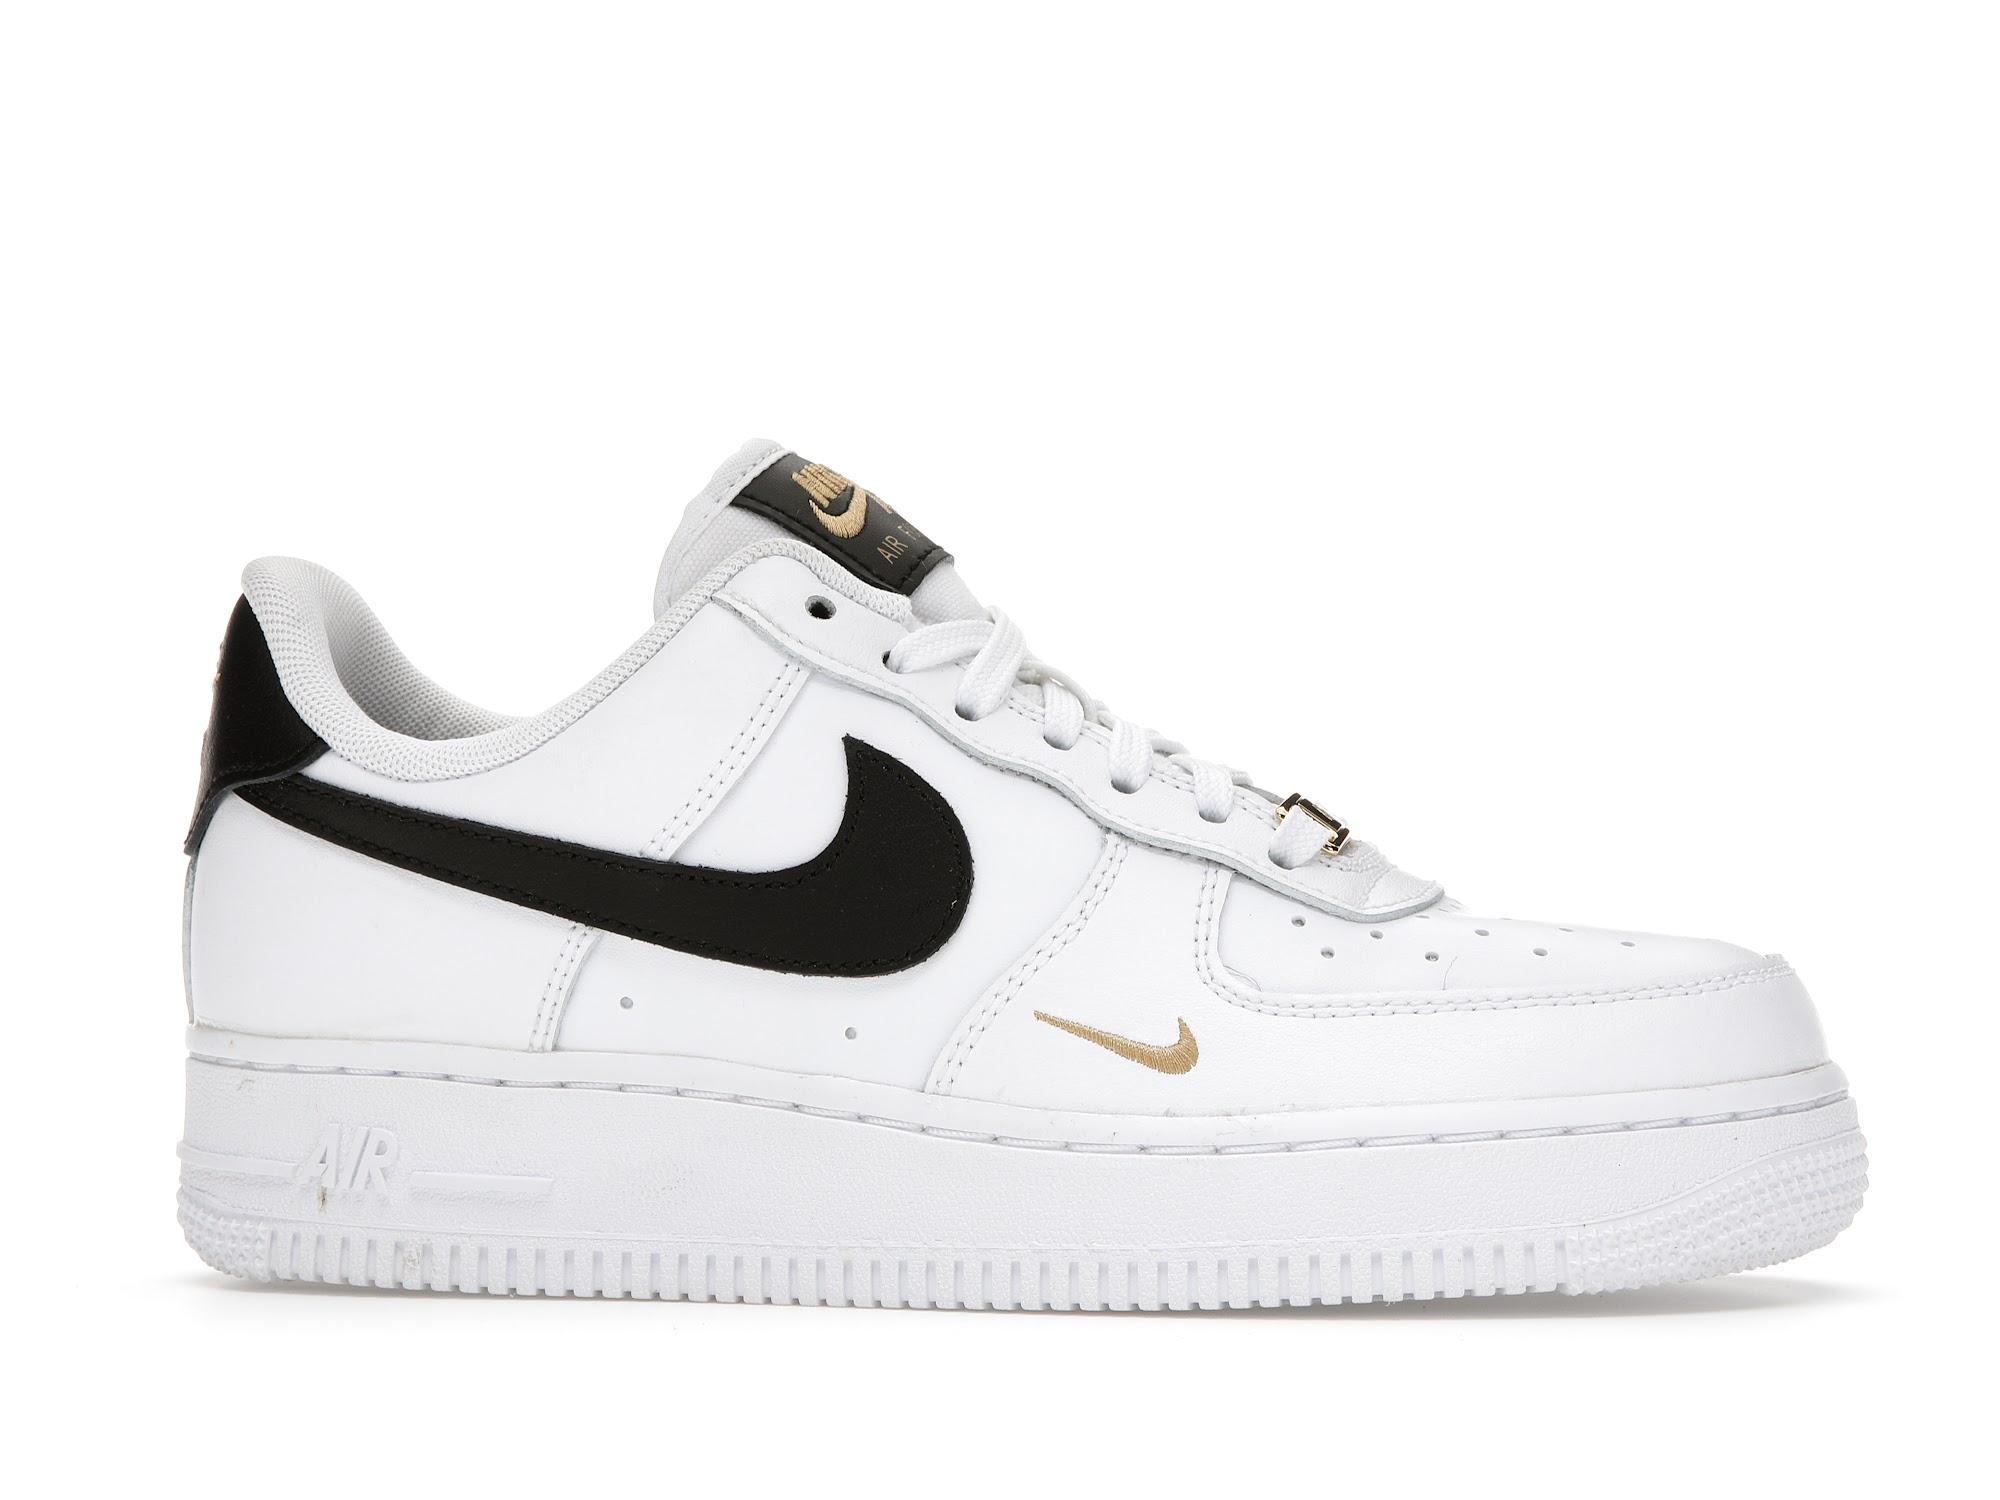 Nike Air Force 1 Low 07 Essential White Black Gold Mini Swoosh (W)